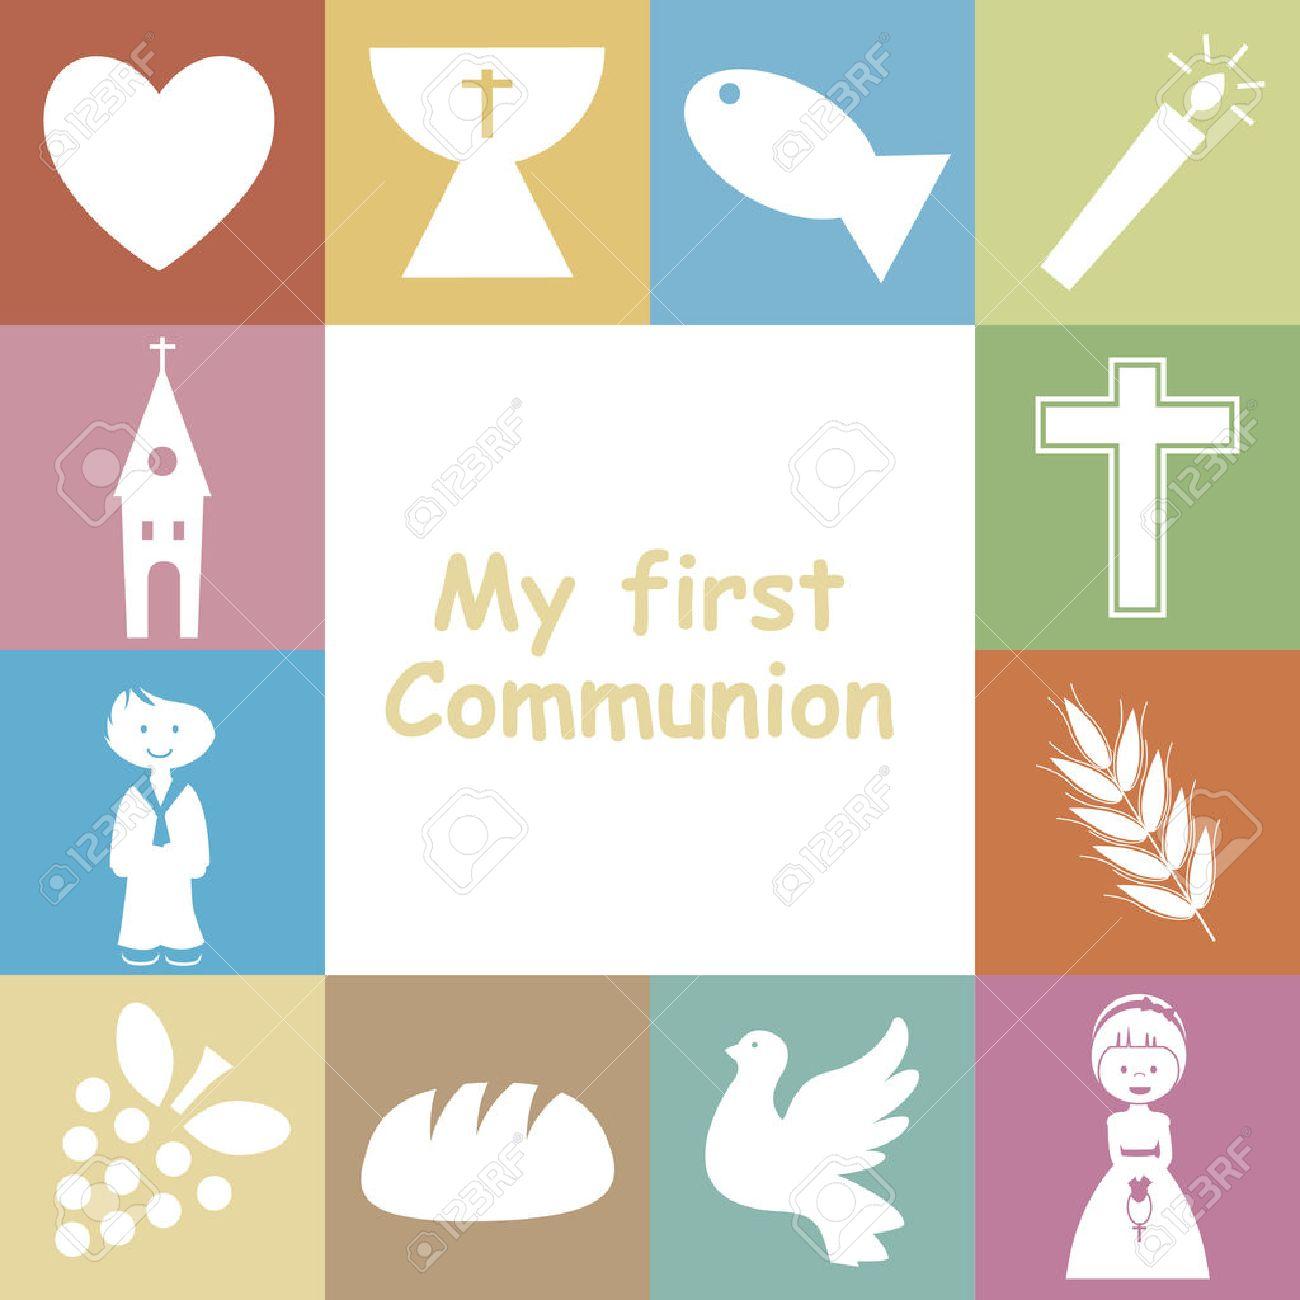 First Communion Invitation Card Stock Vector - 25470067